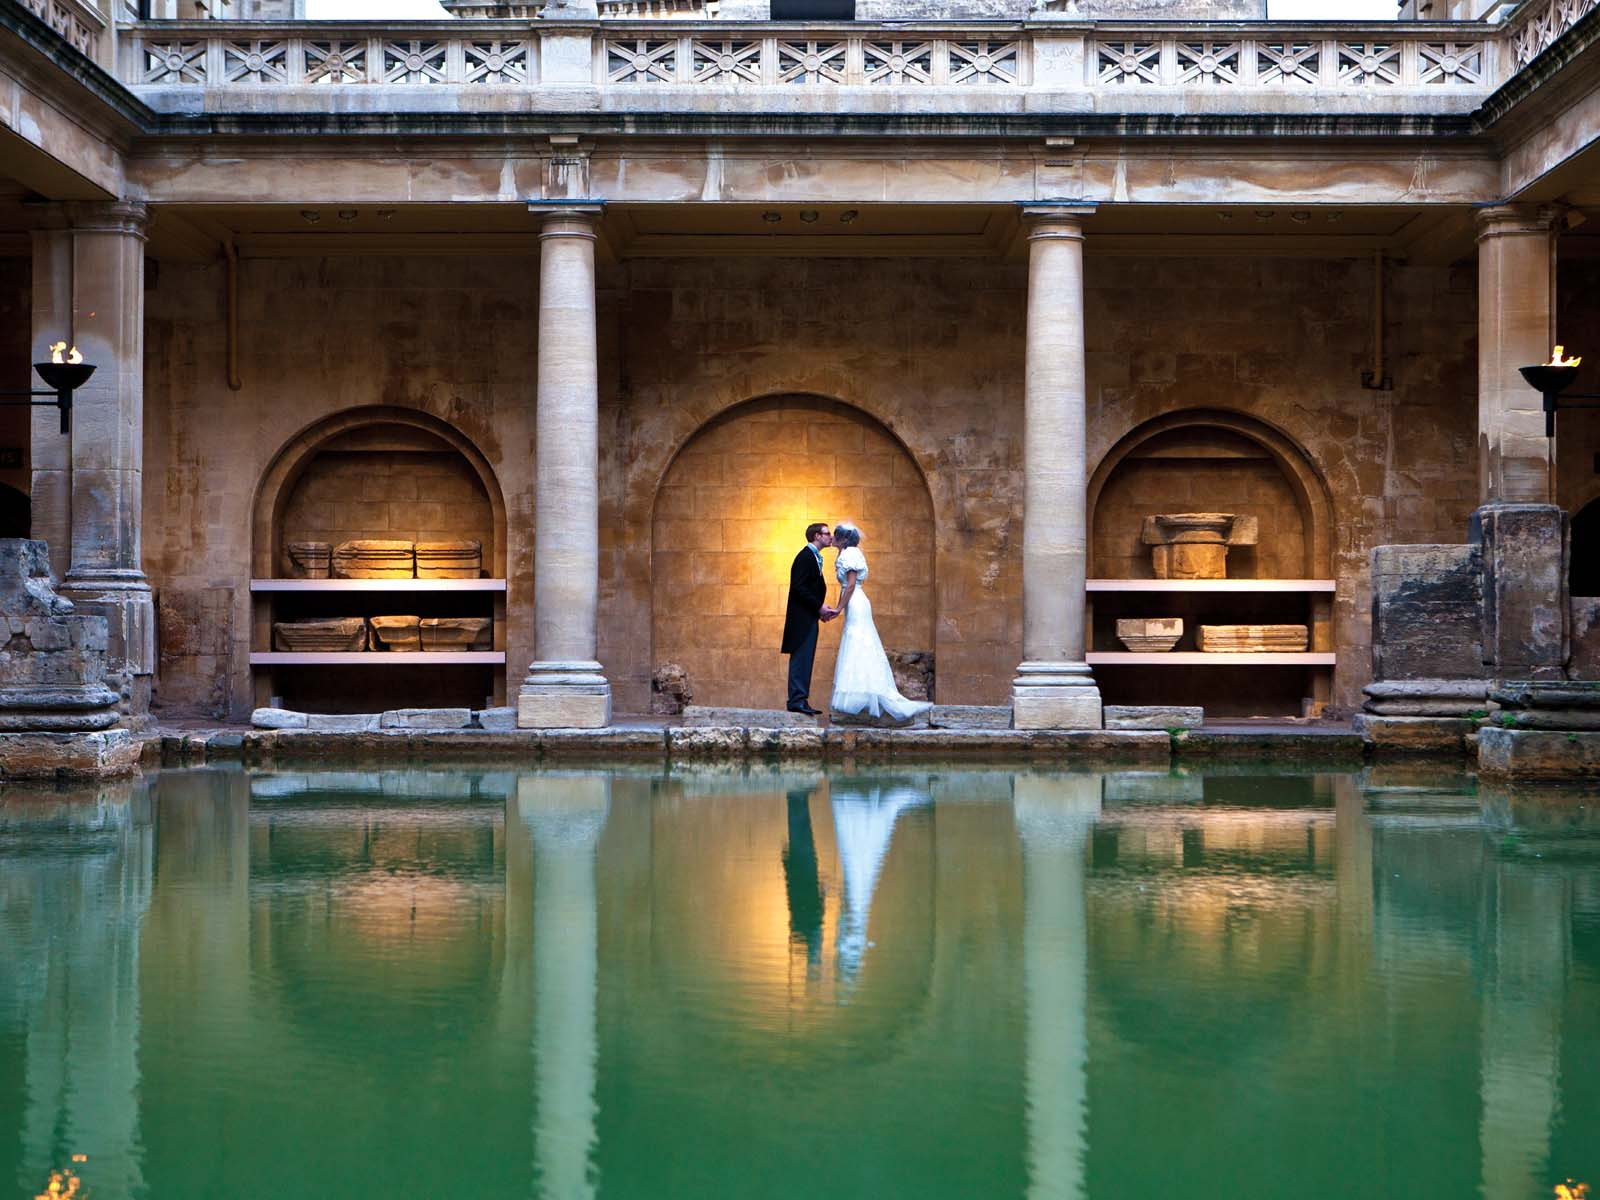 Roman Baths Facts